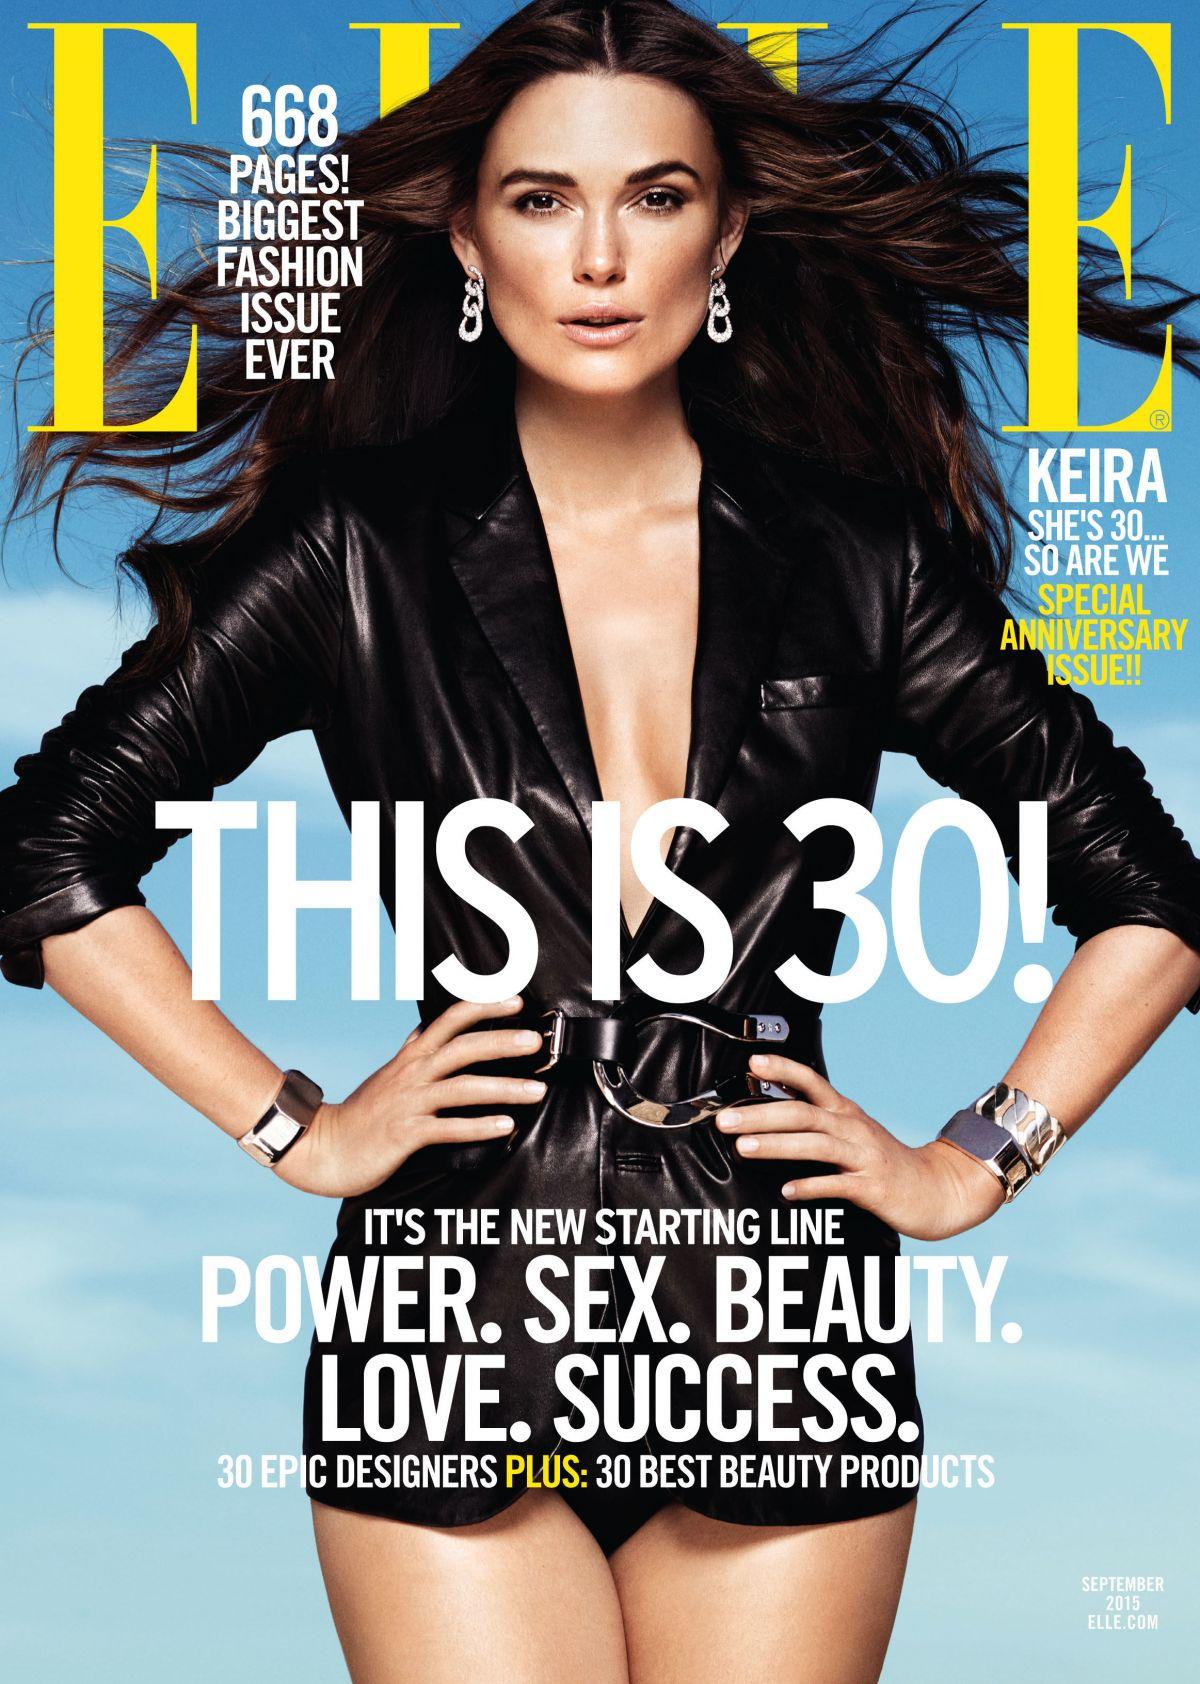 KEIRA KNIGHTLEY in Elle Magazine, September 2015 Issue